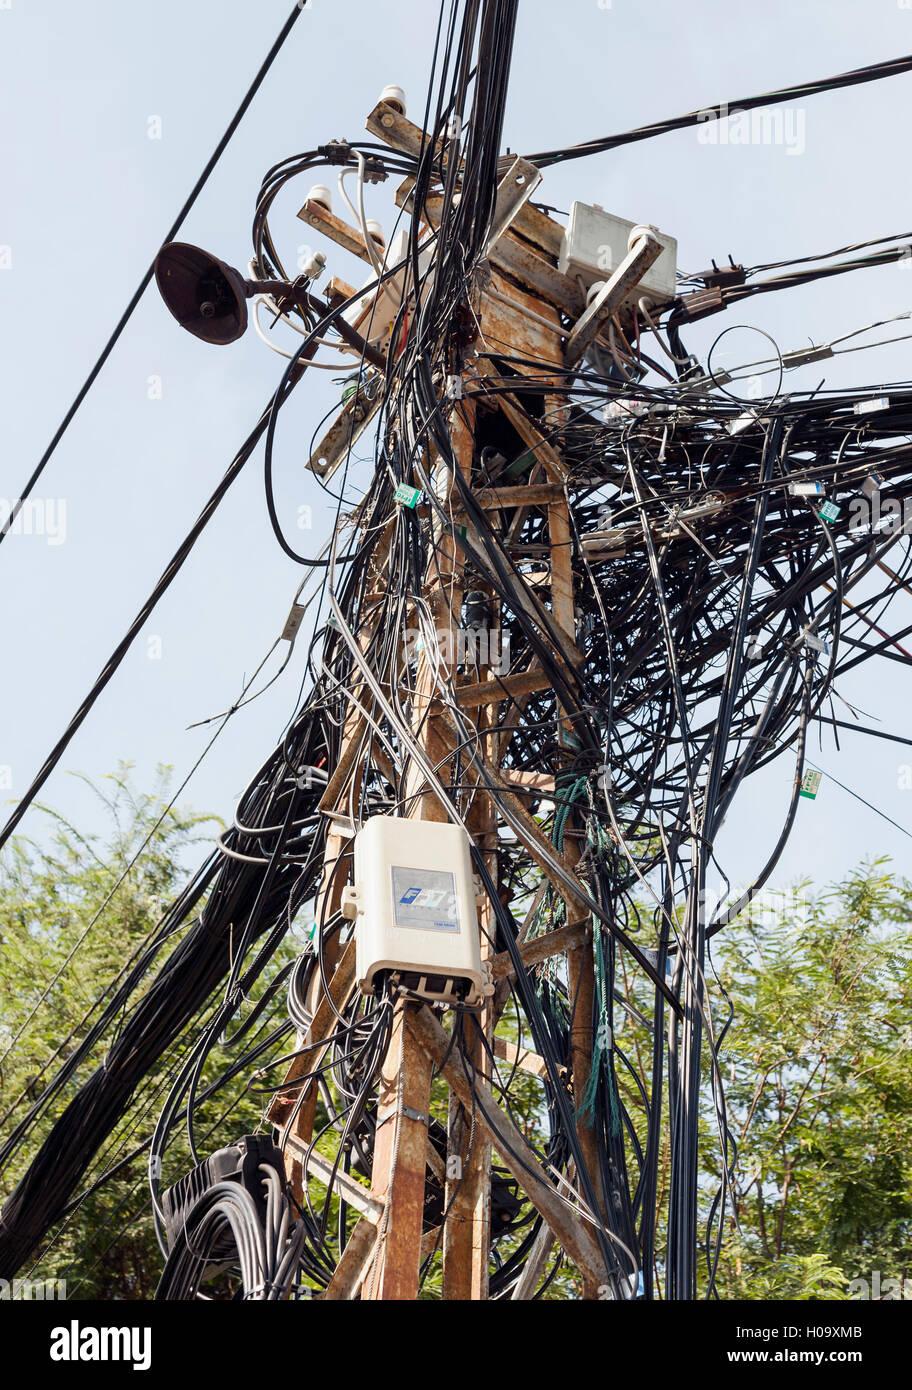 Cable jumble, Vietnam - Stock Image